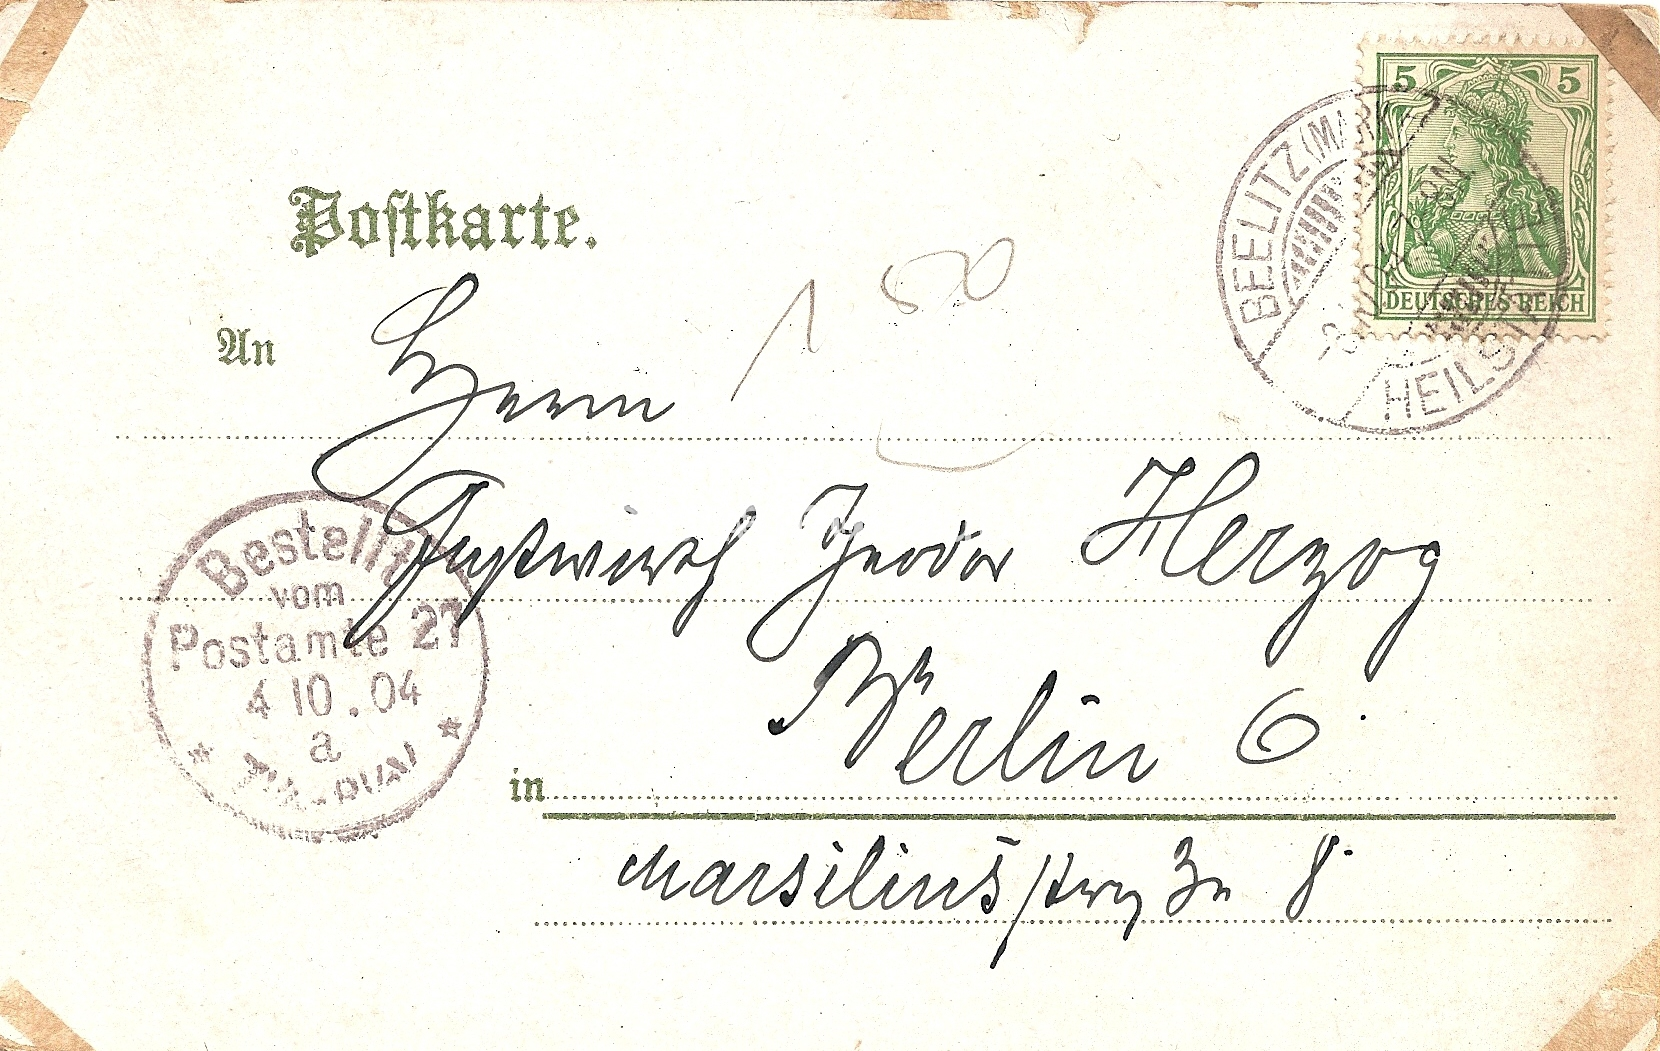 1904 10 03